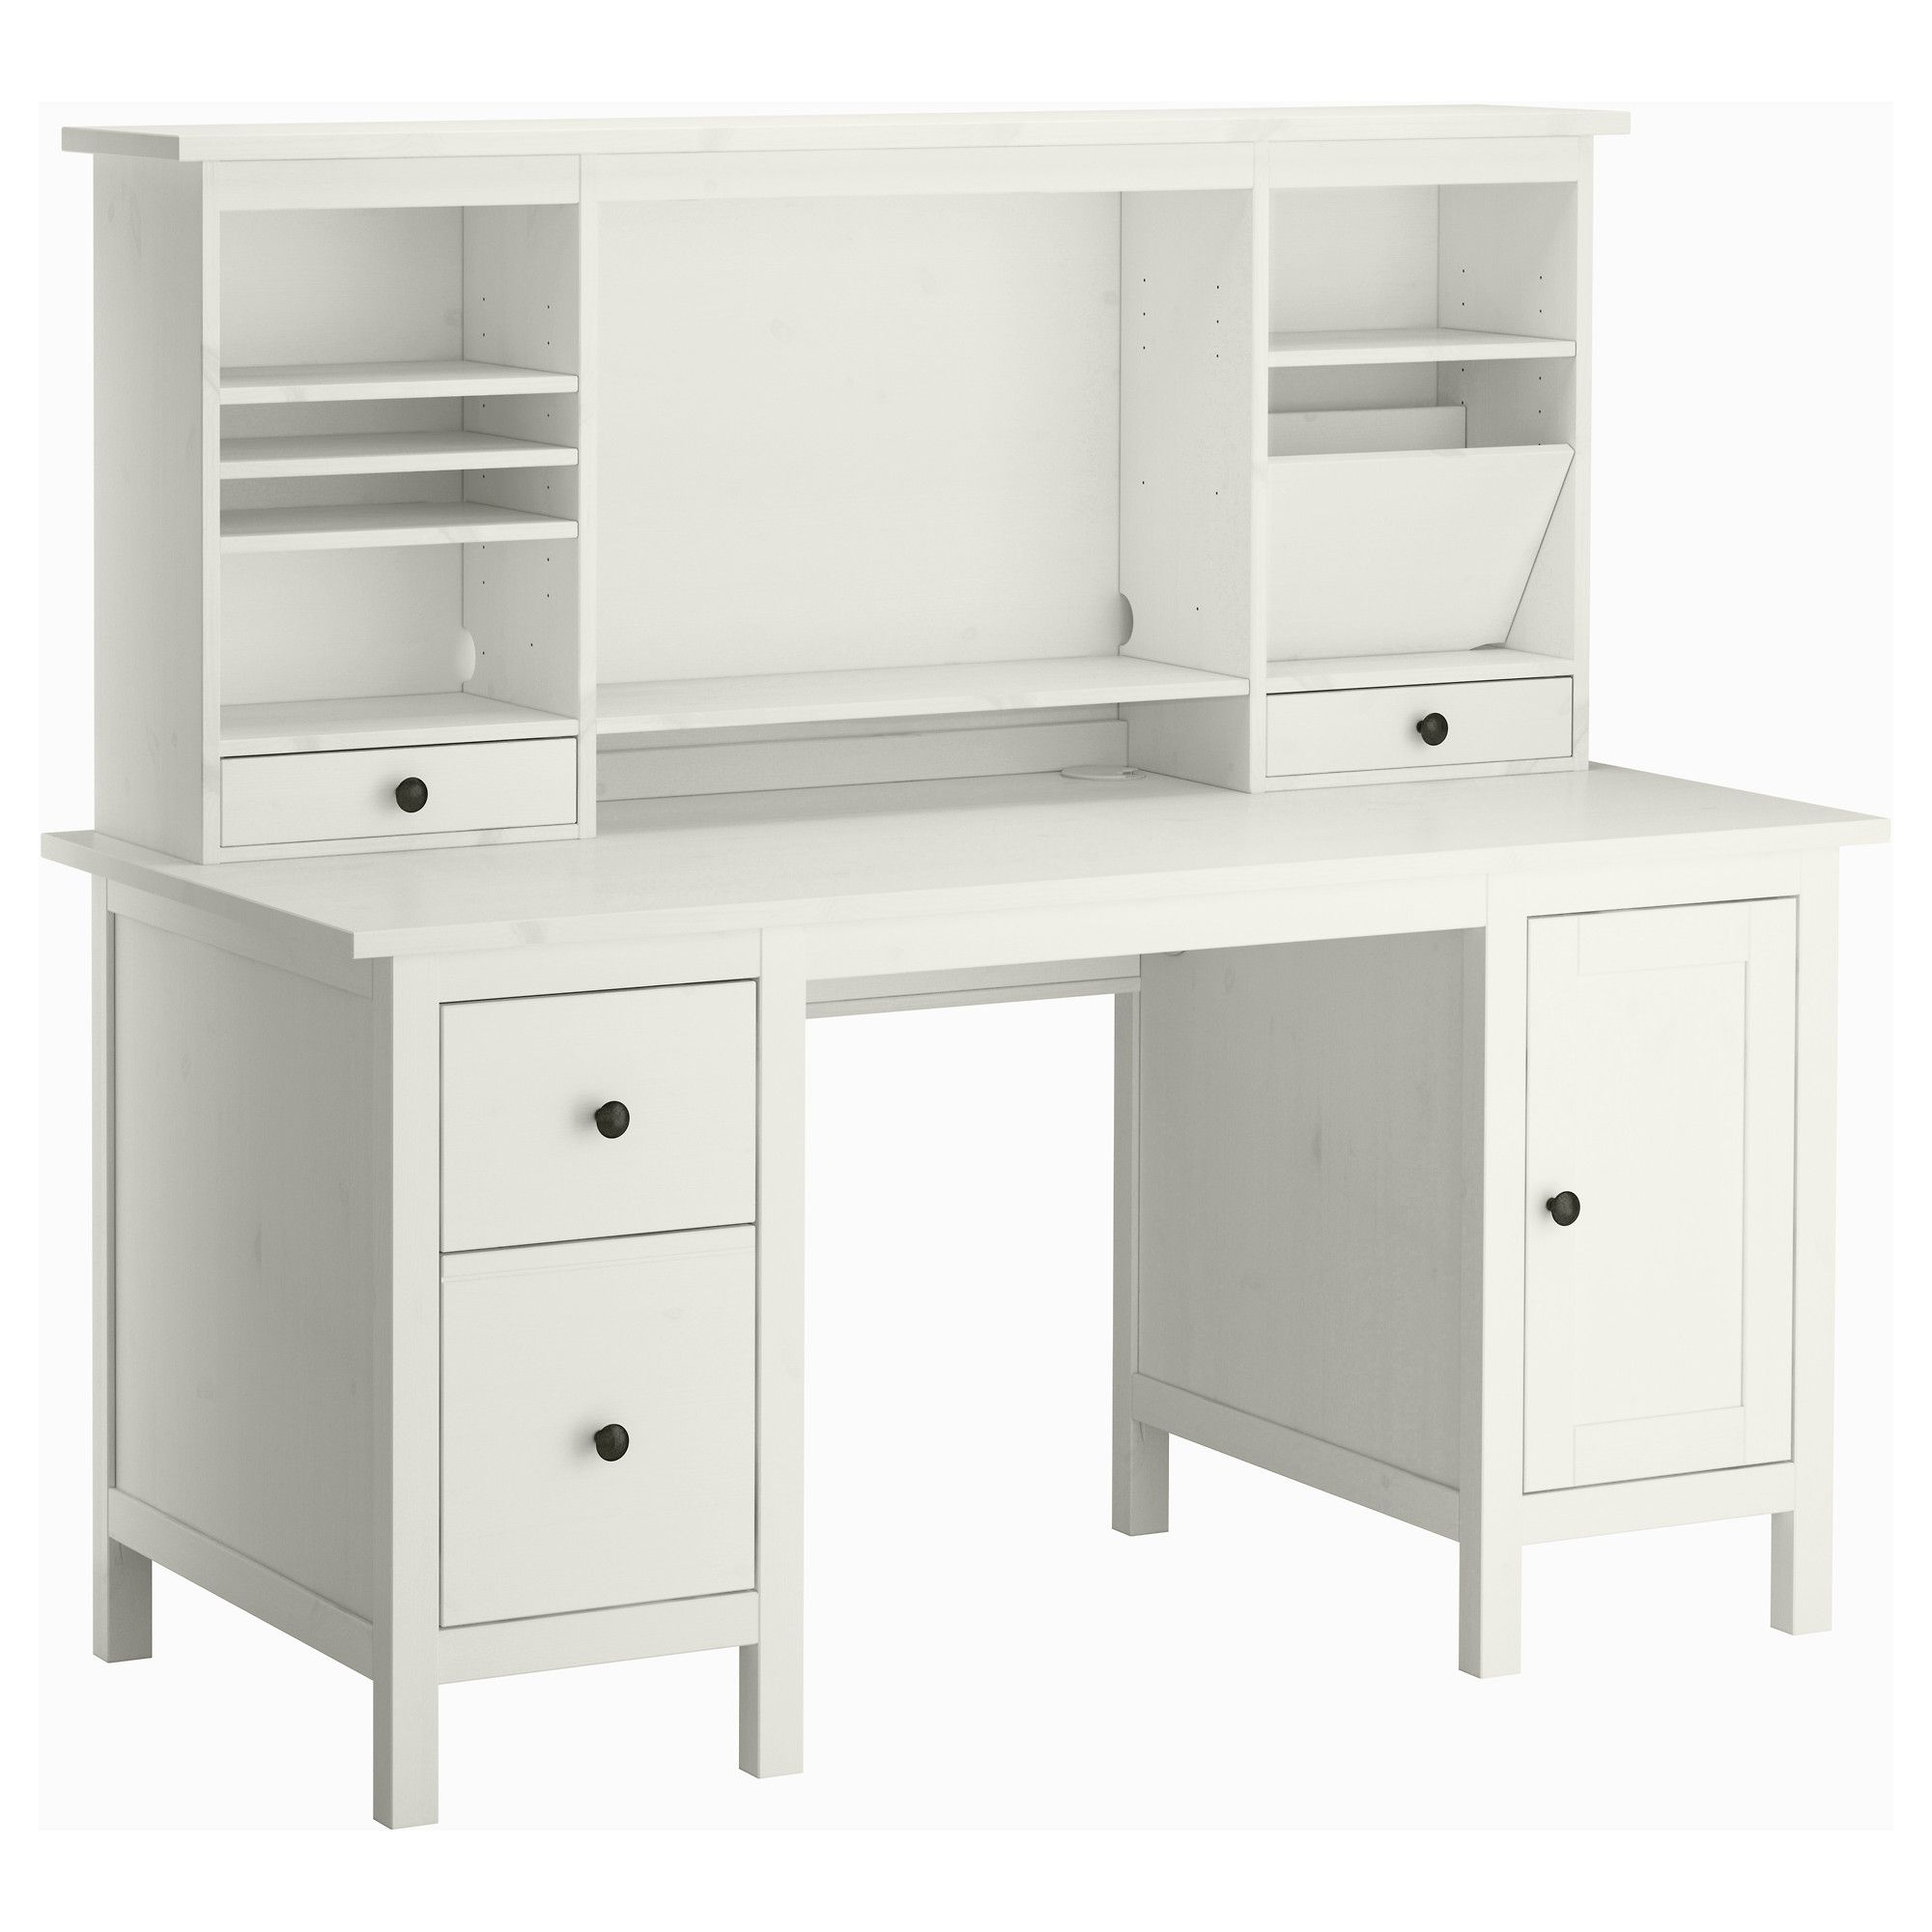 Escritorio Hemnes T8dj Hemnes Desk with Add On Unit White Stain Ink Slinging